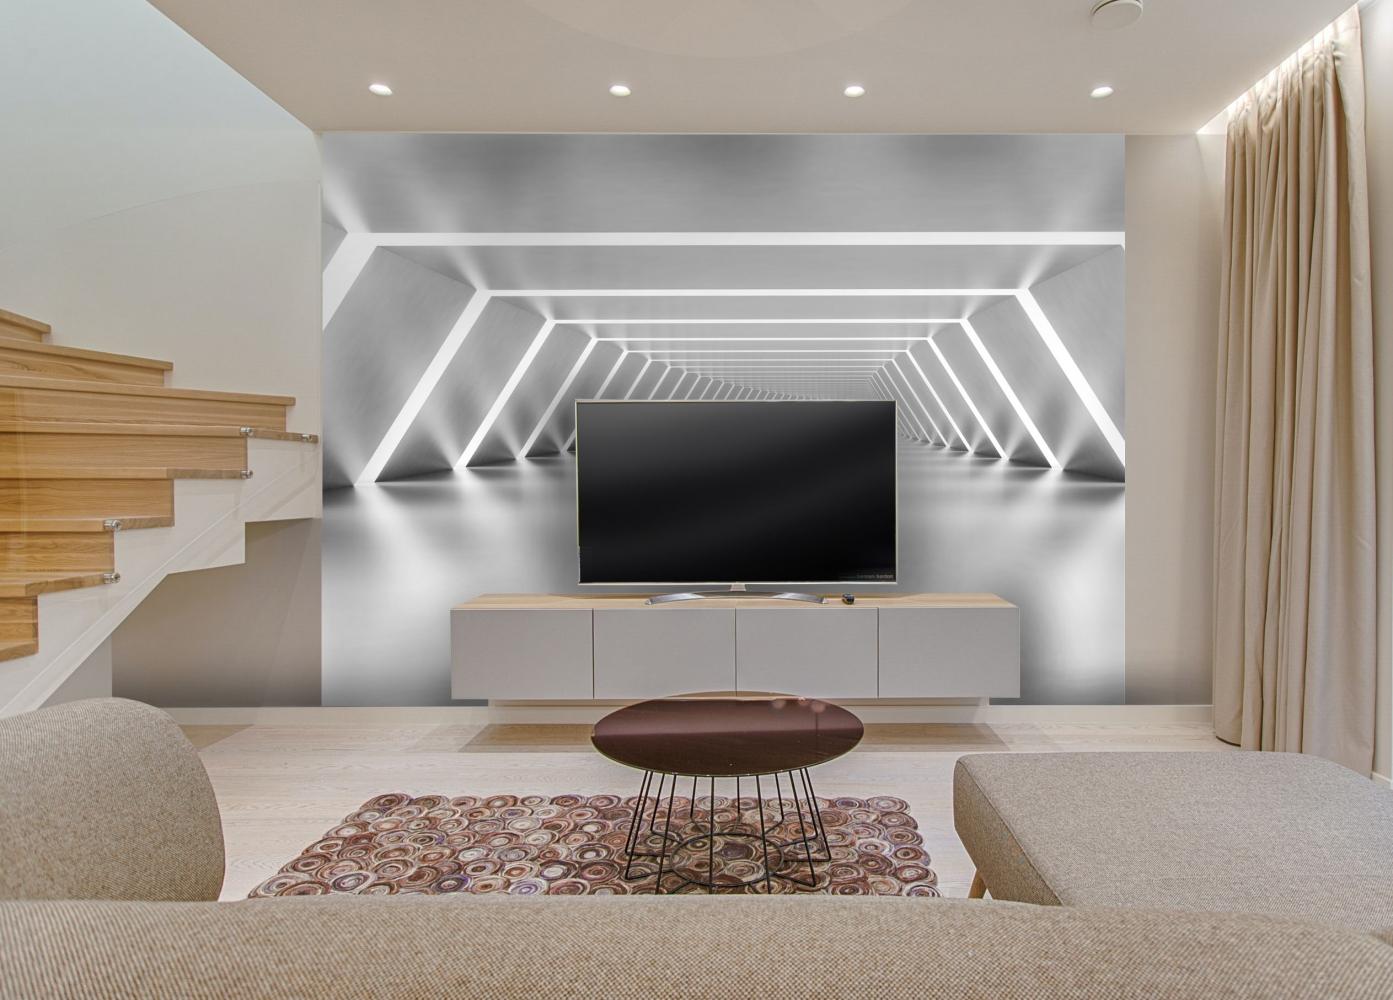 Tapeta 3D Tunel, 504 x 310 cm